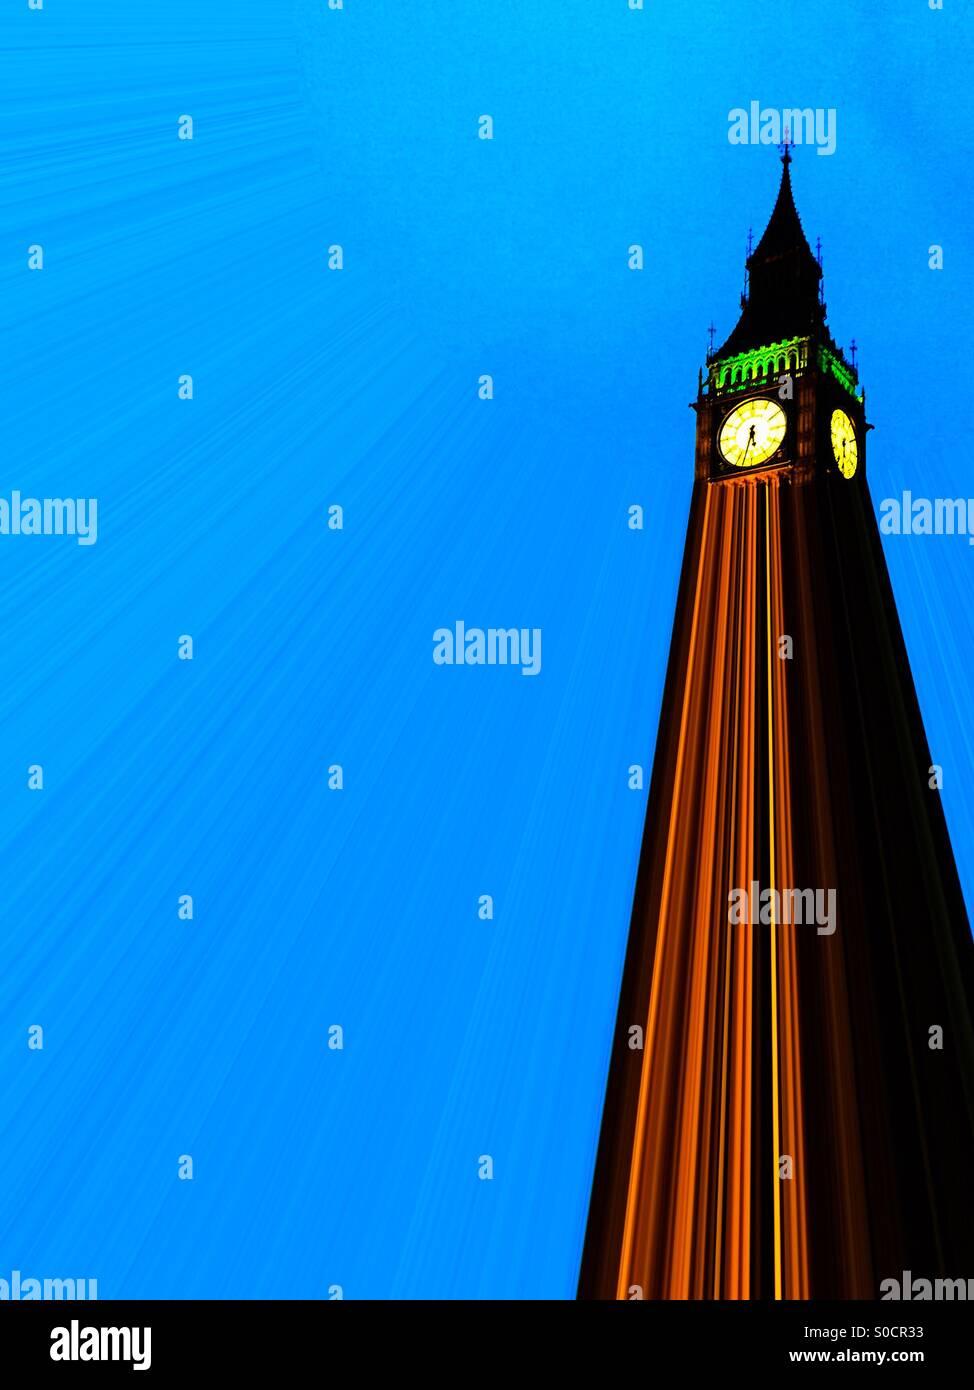 Big Ben projected - Stock Image